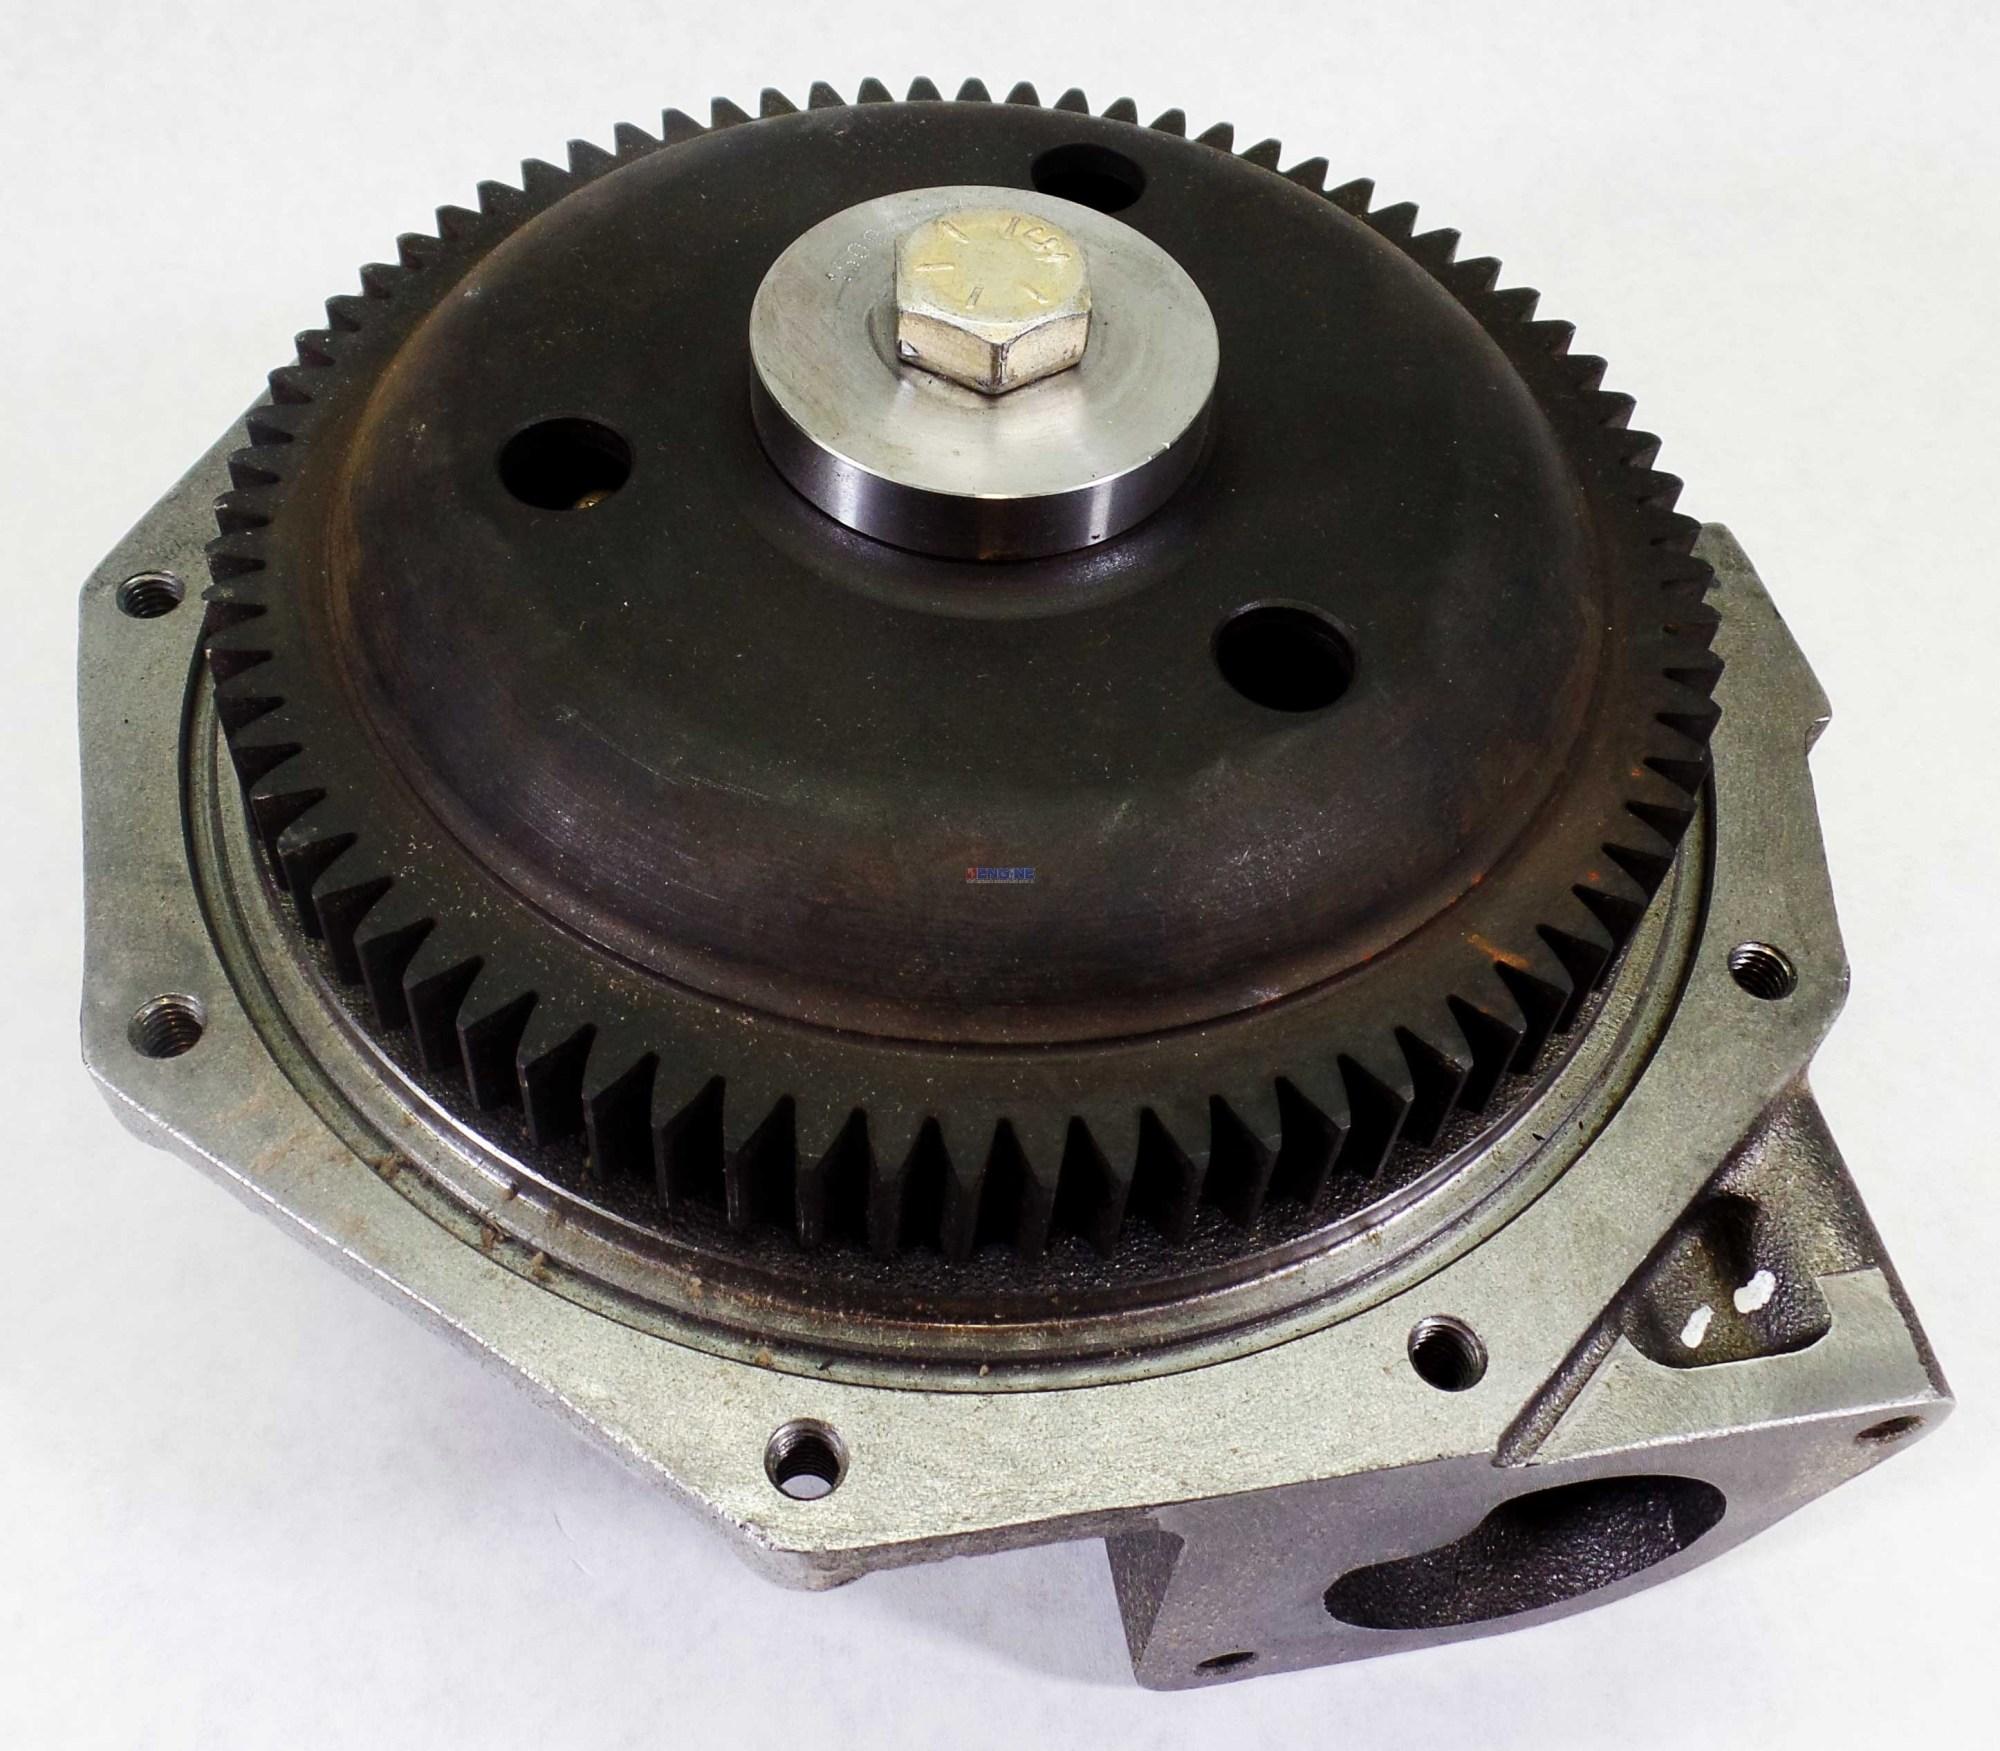 hight resolution of cat engine 3406 crank no start problem discussion on topix